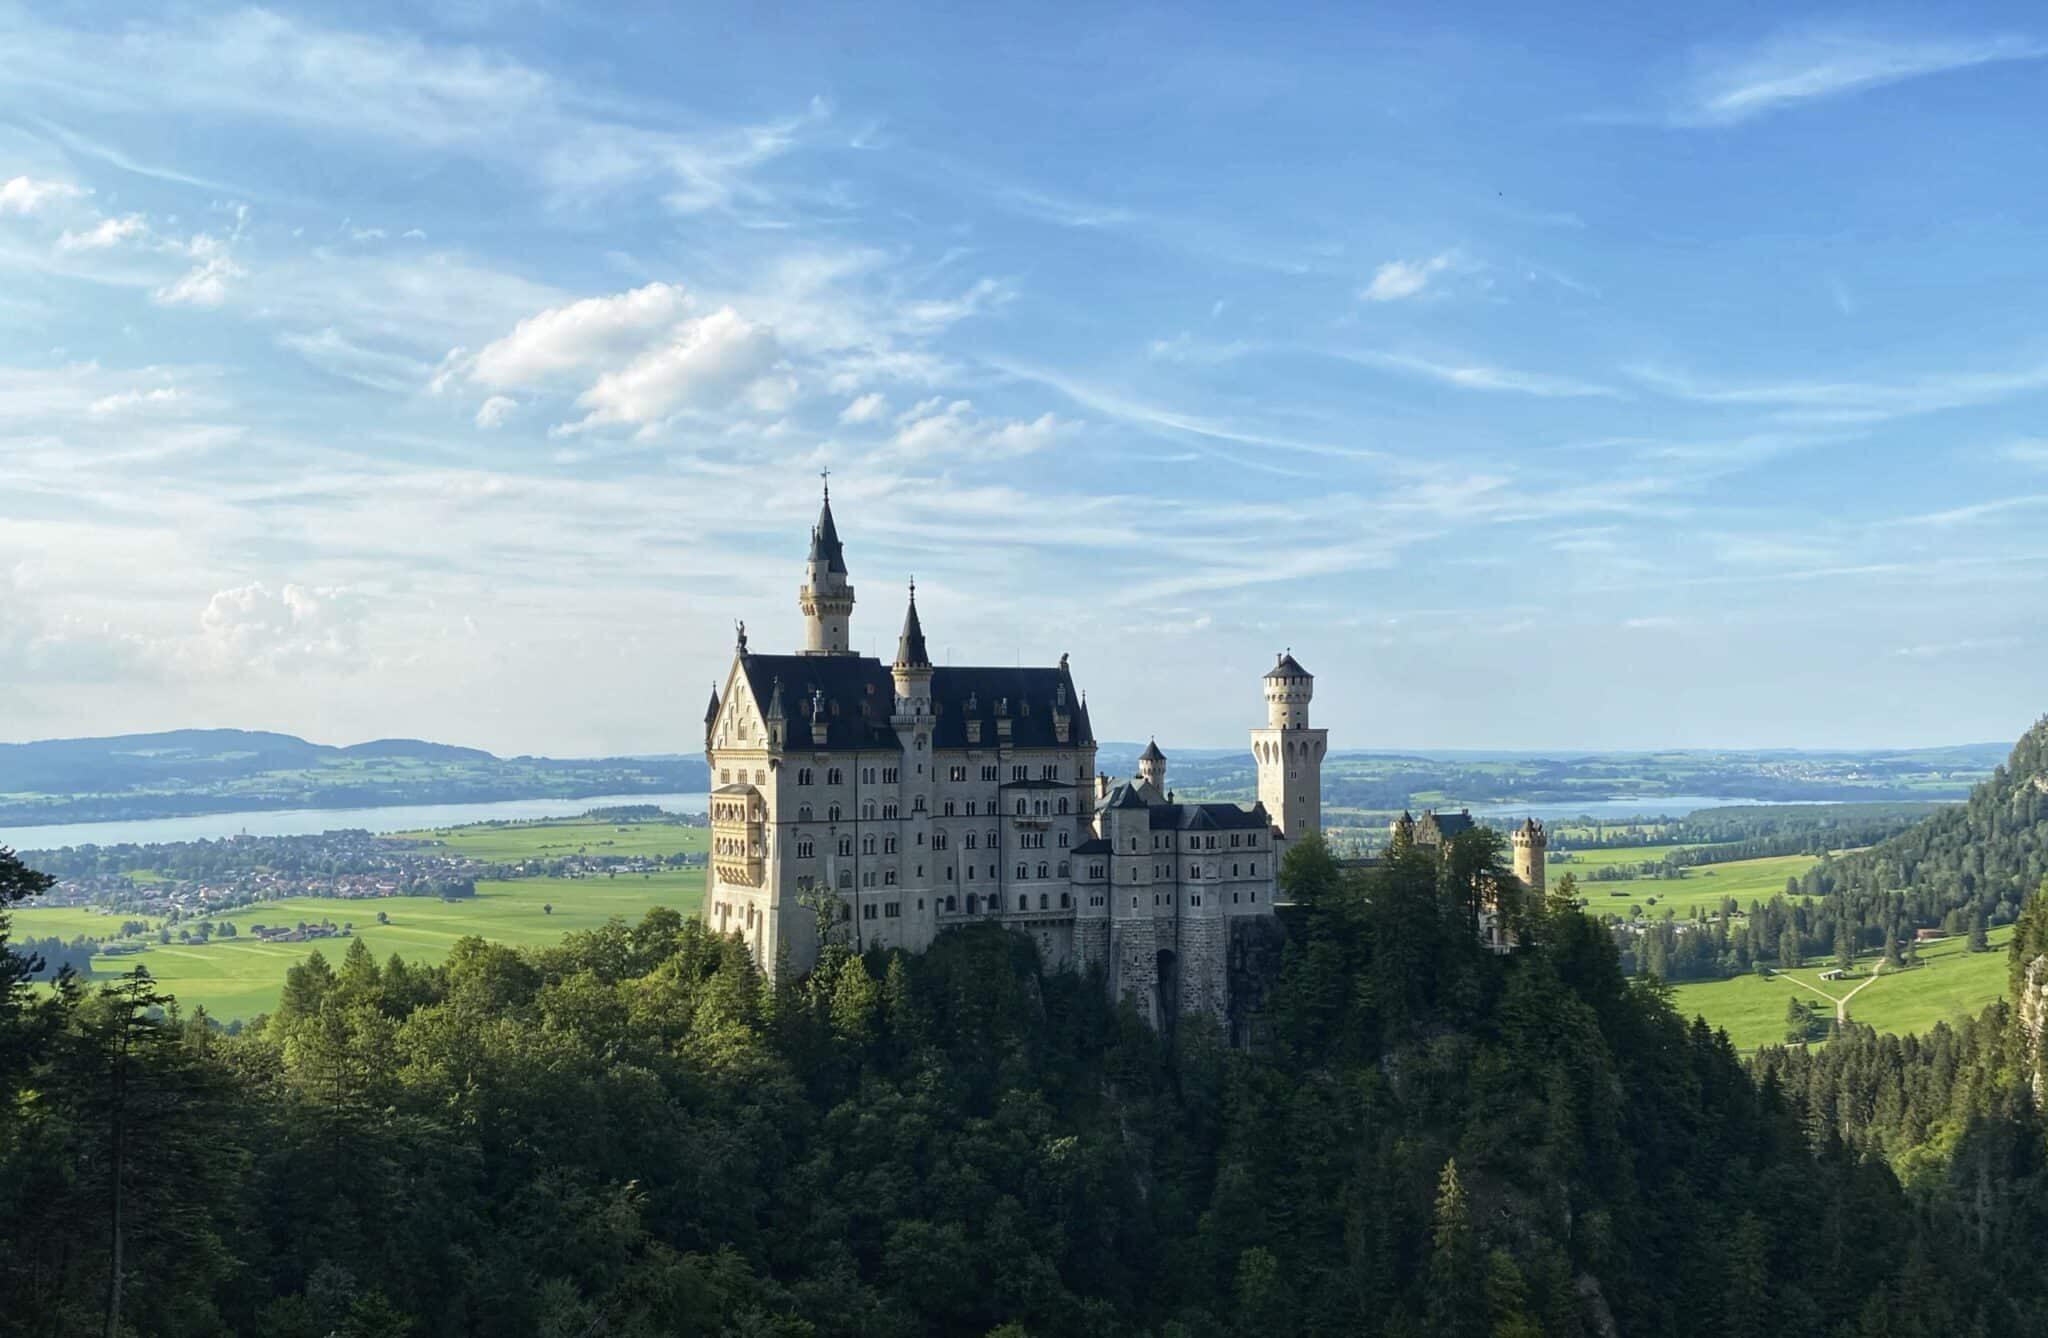 Visit Neuschwanstein Castle & Surroundings in Germany